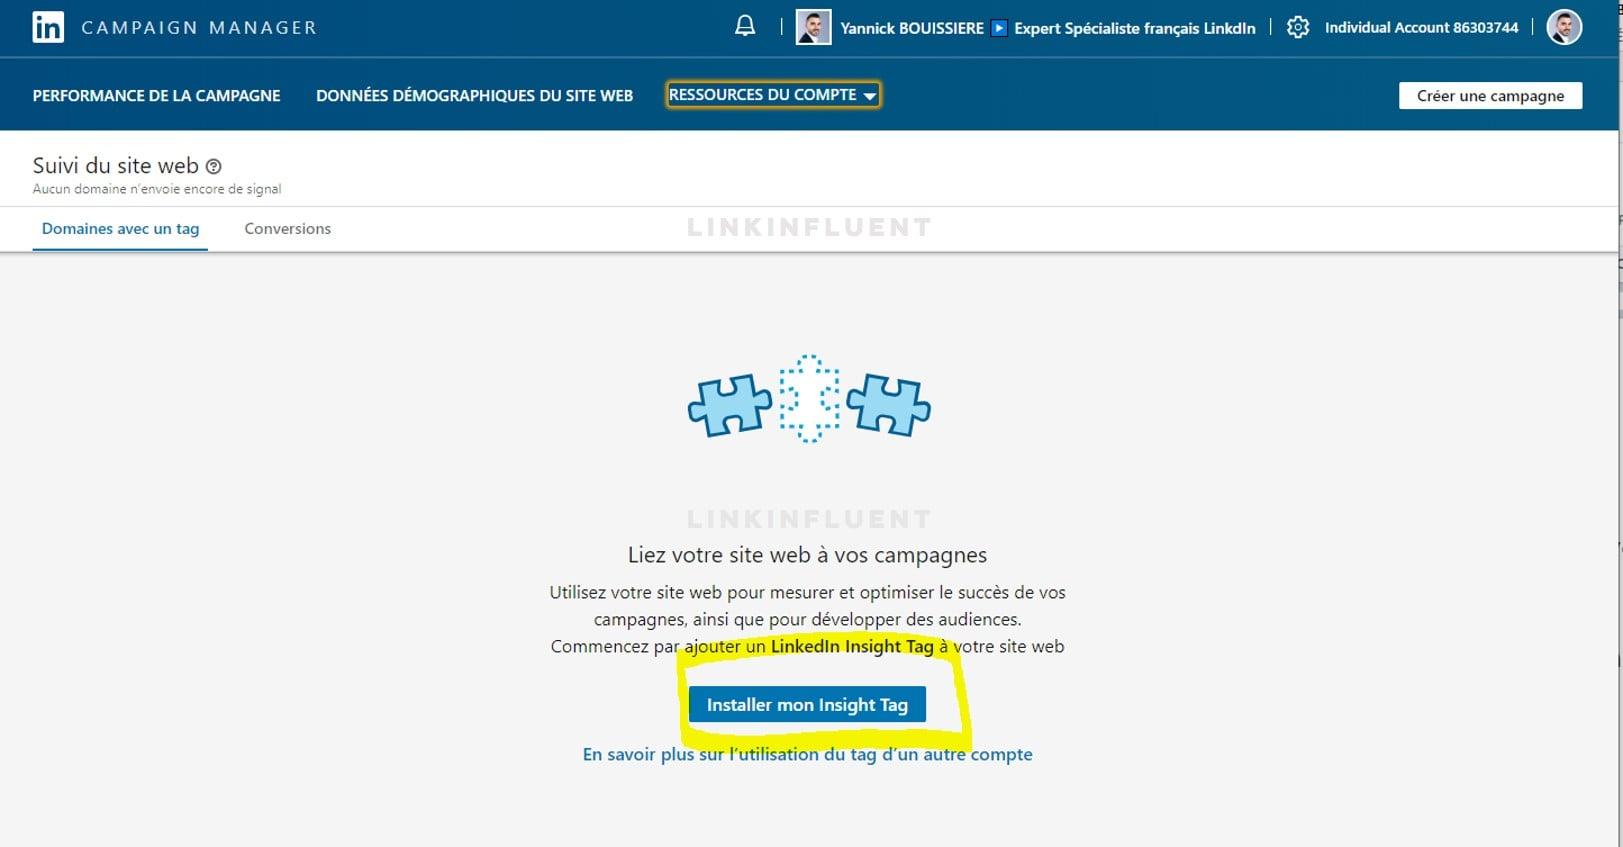 Tutoriel d'installation du Pixel LinkedIn (LinkedIn insight tag) - Etape 4 - Proinfluent